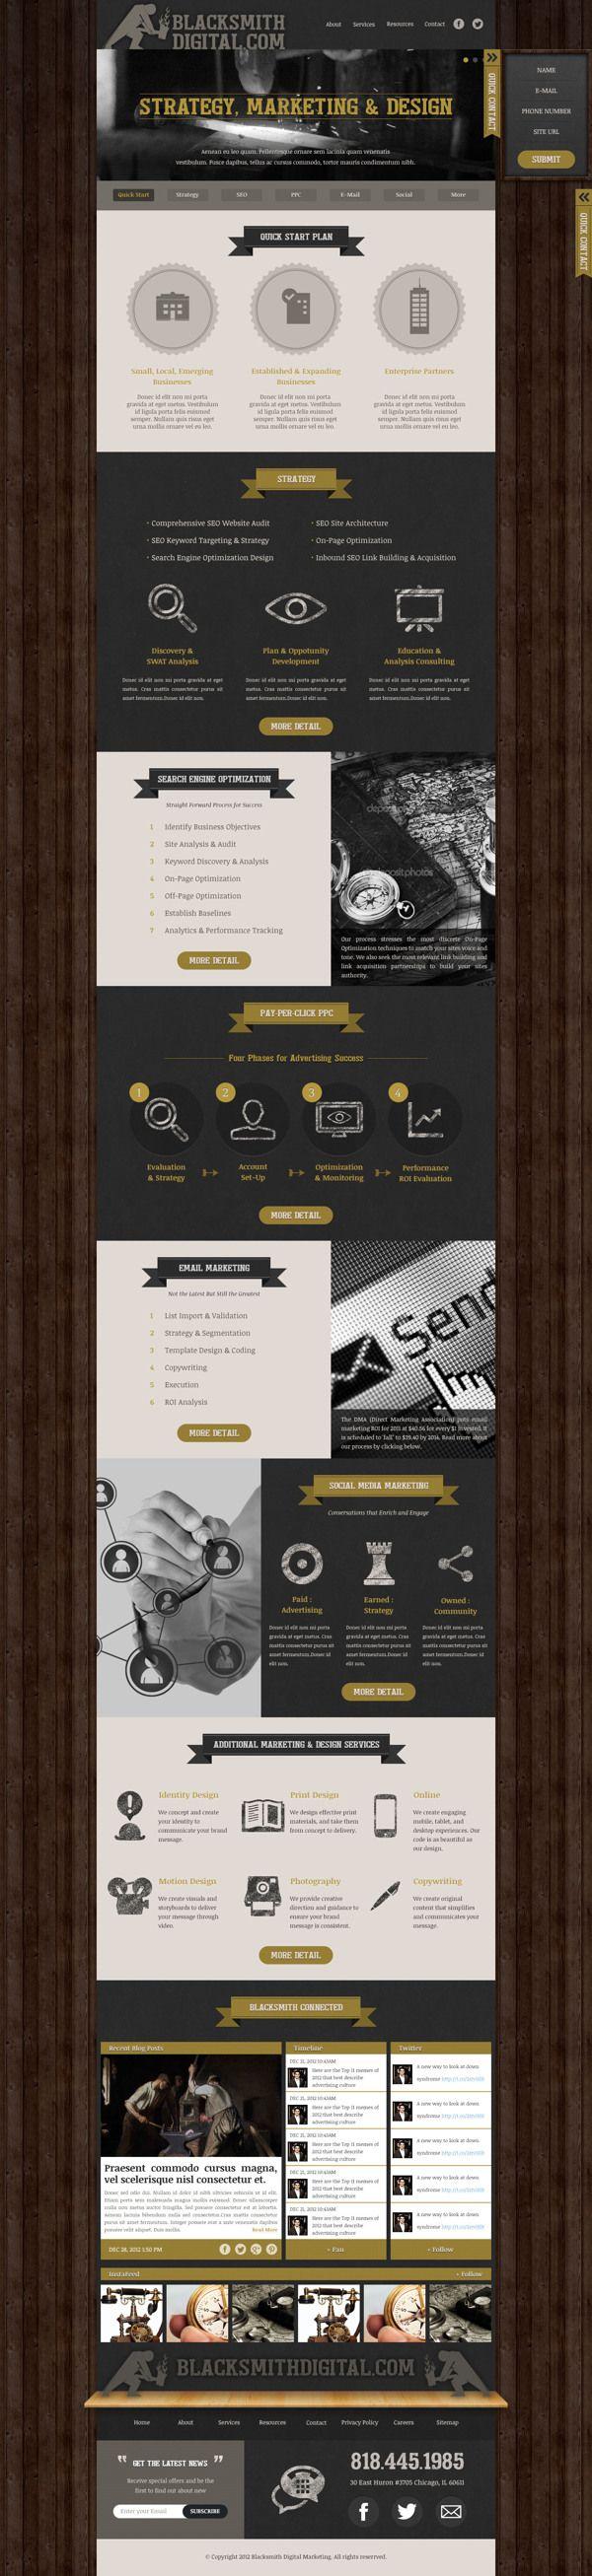 Digital Agency Blacksmithdigital.com wesite design